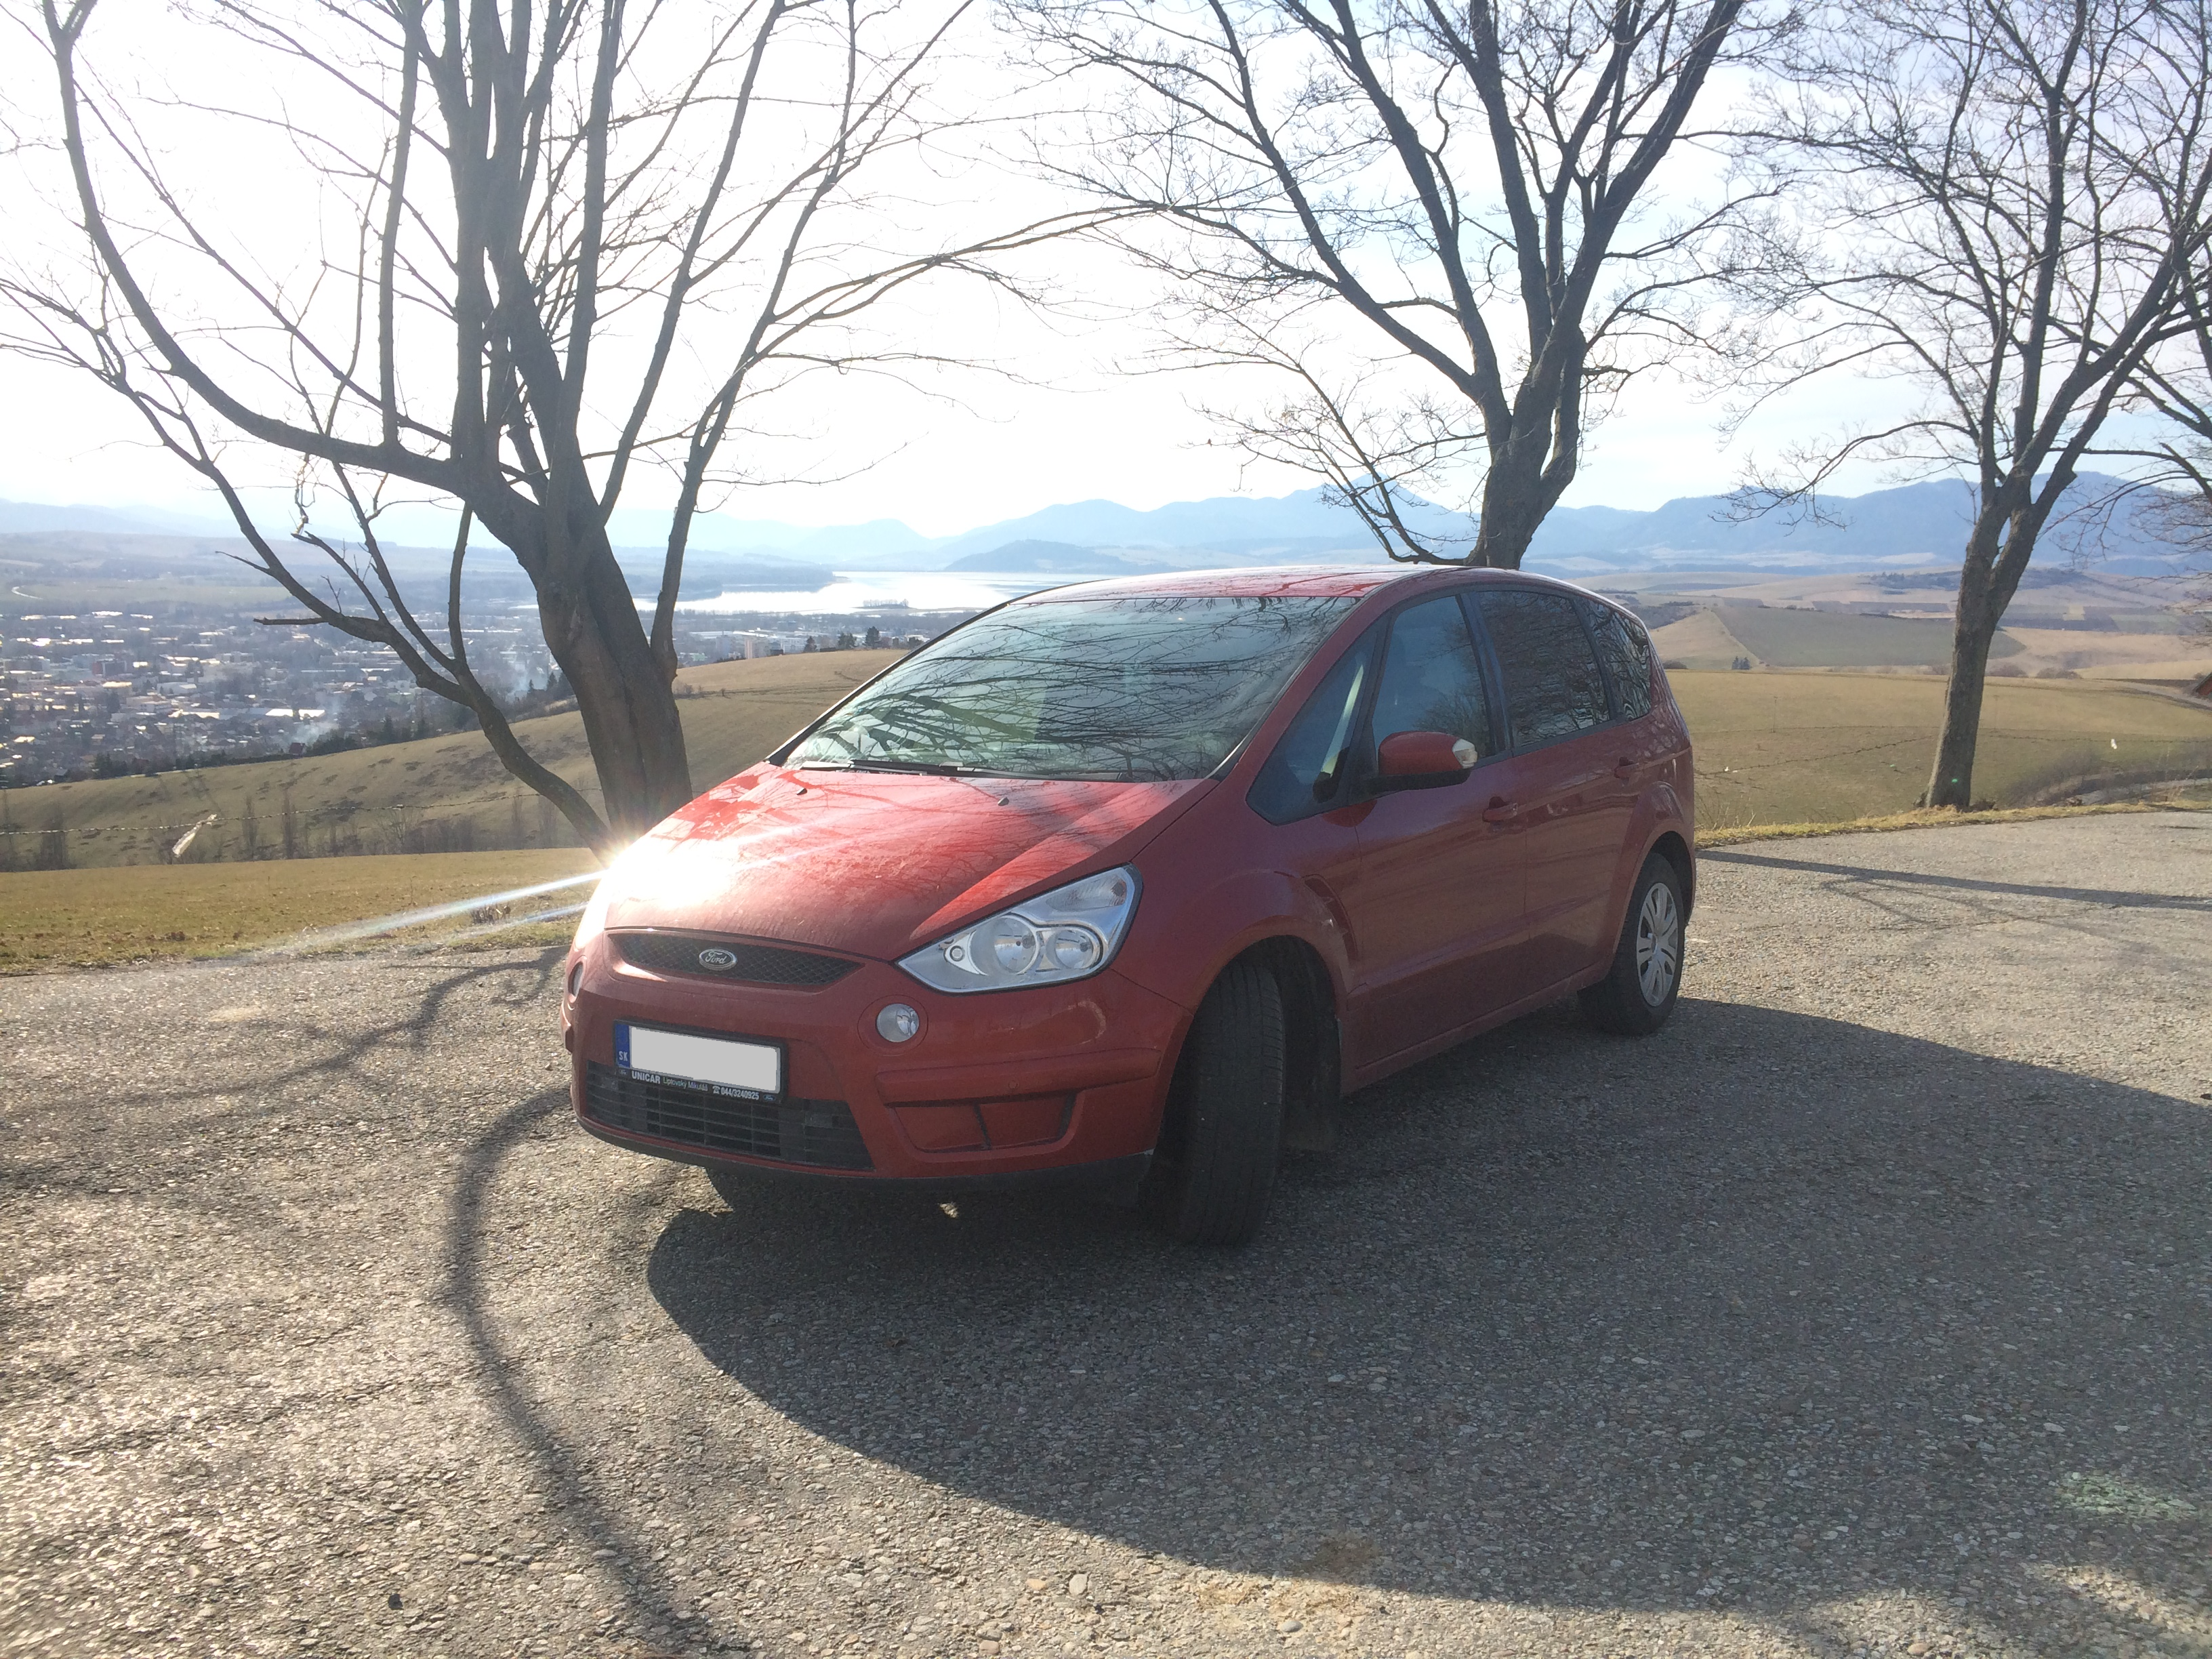 TEST Jazdenky Ford S-Max 2.0 Duratec 1.gen